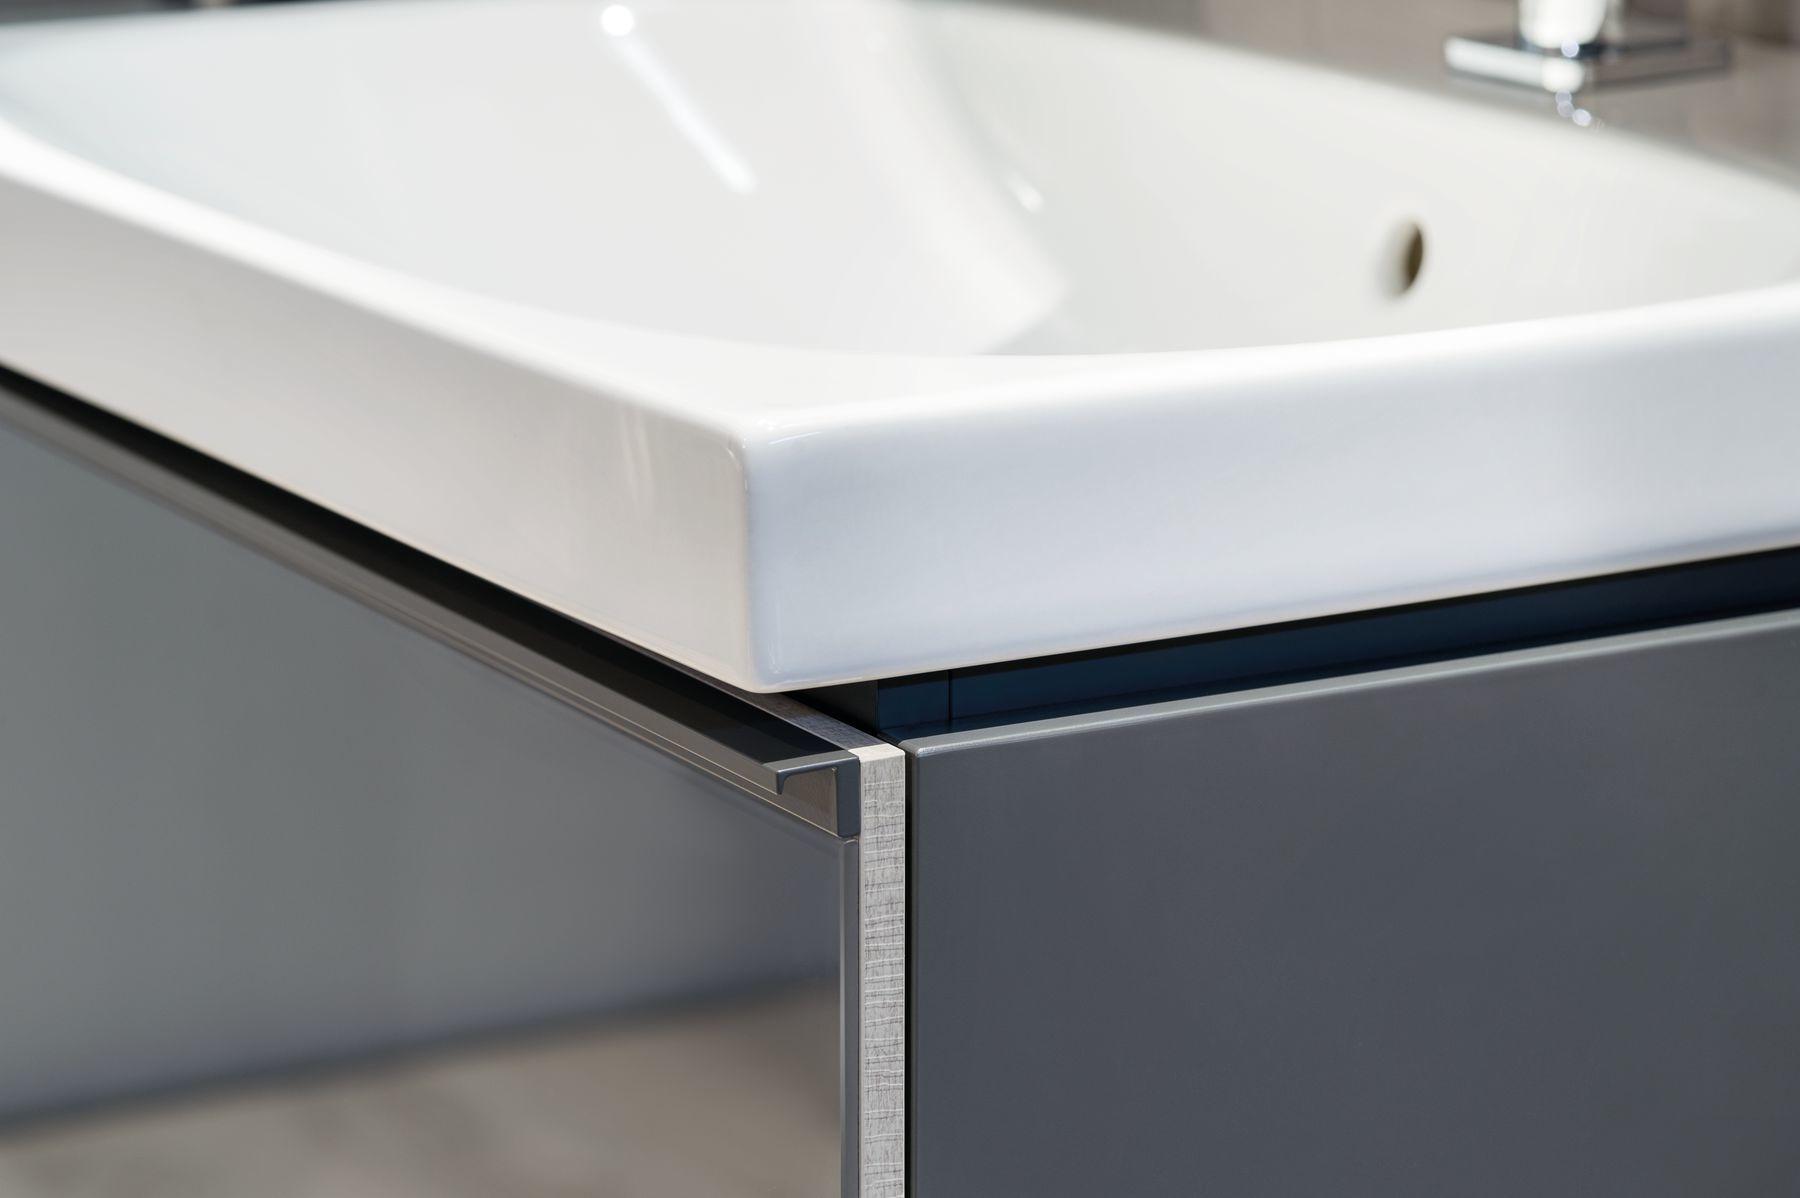 Geberit Acanto bathroom series